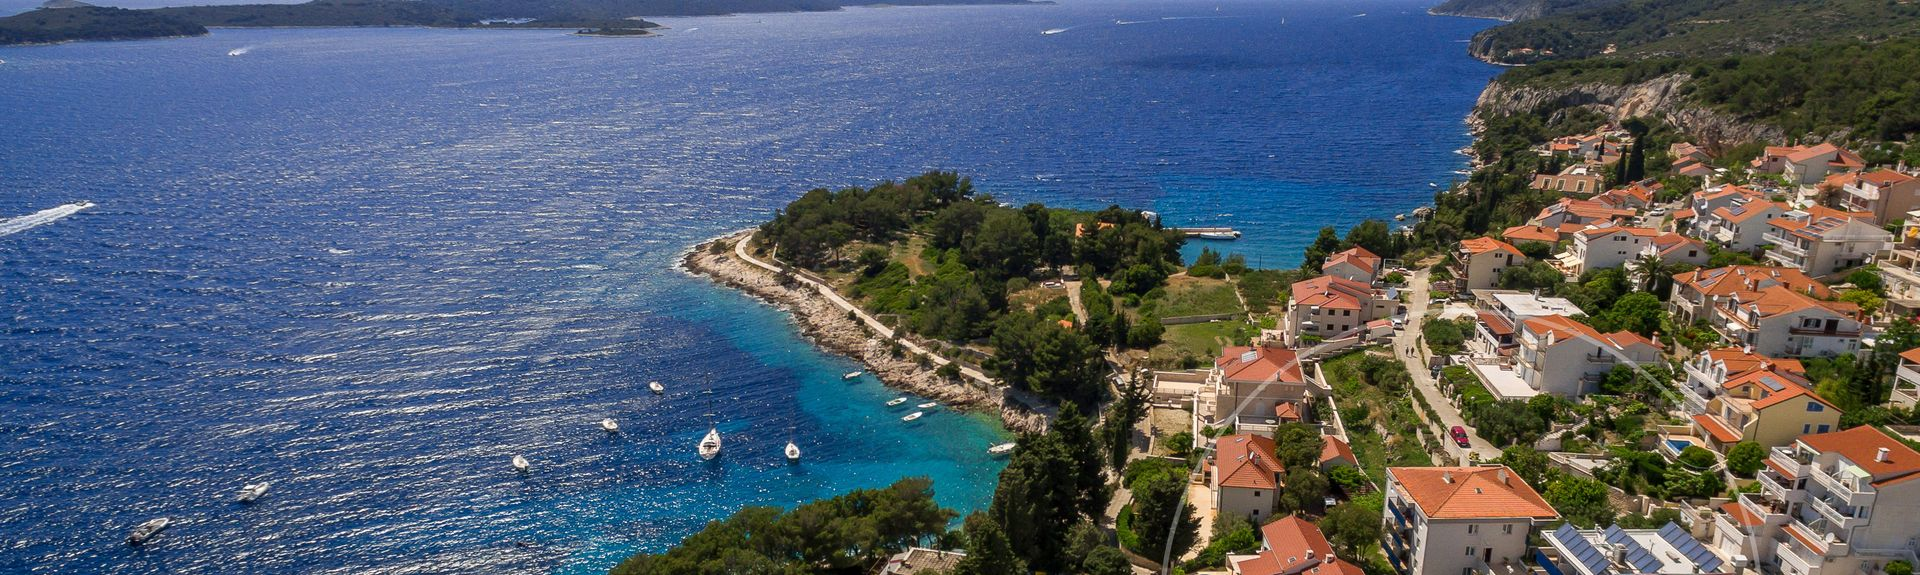 Zaglavs strand, Milna, Split-Dalmatiens län, HR